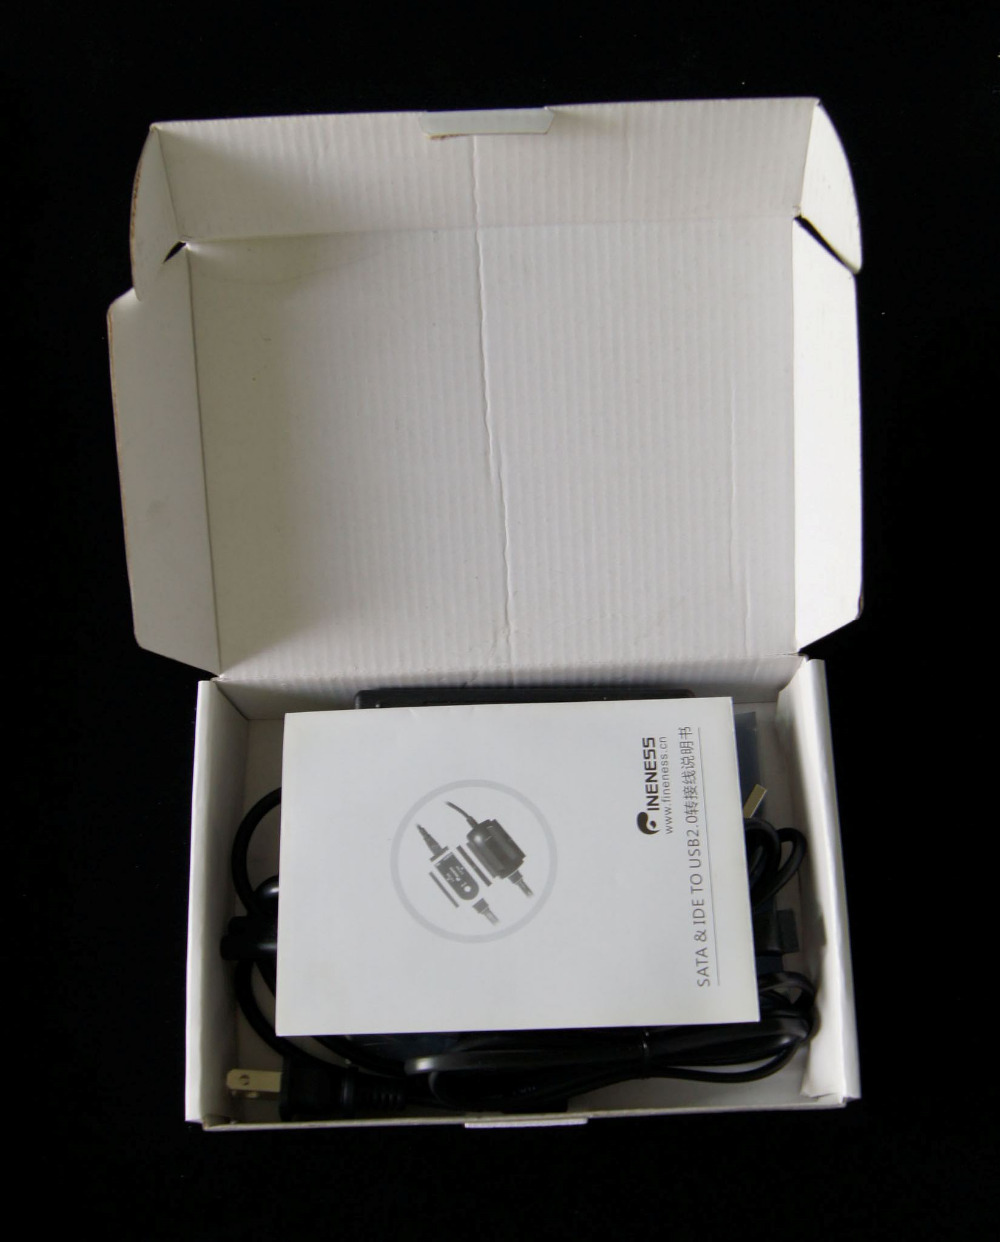 DSC00404.JPG